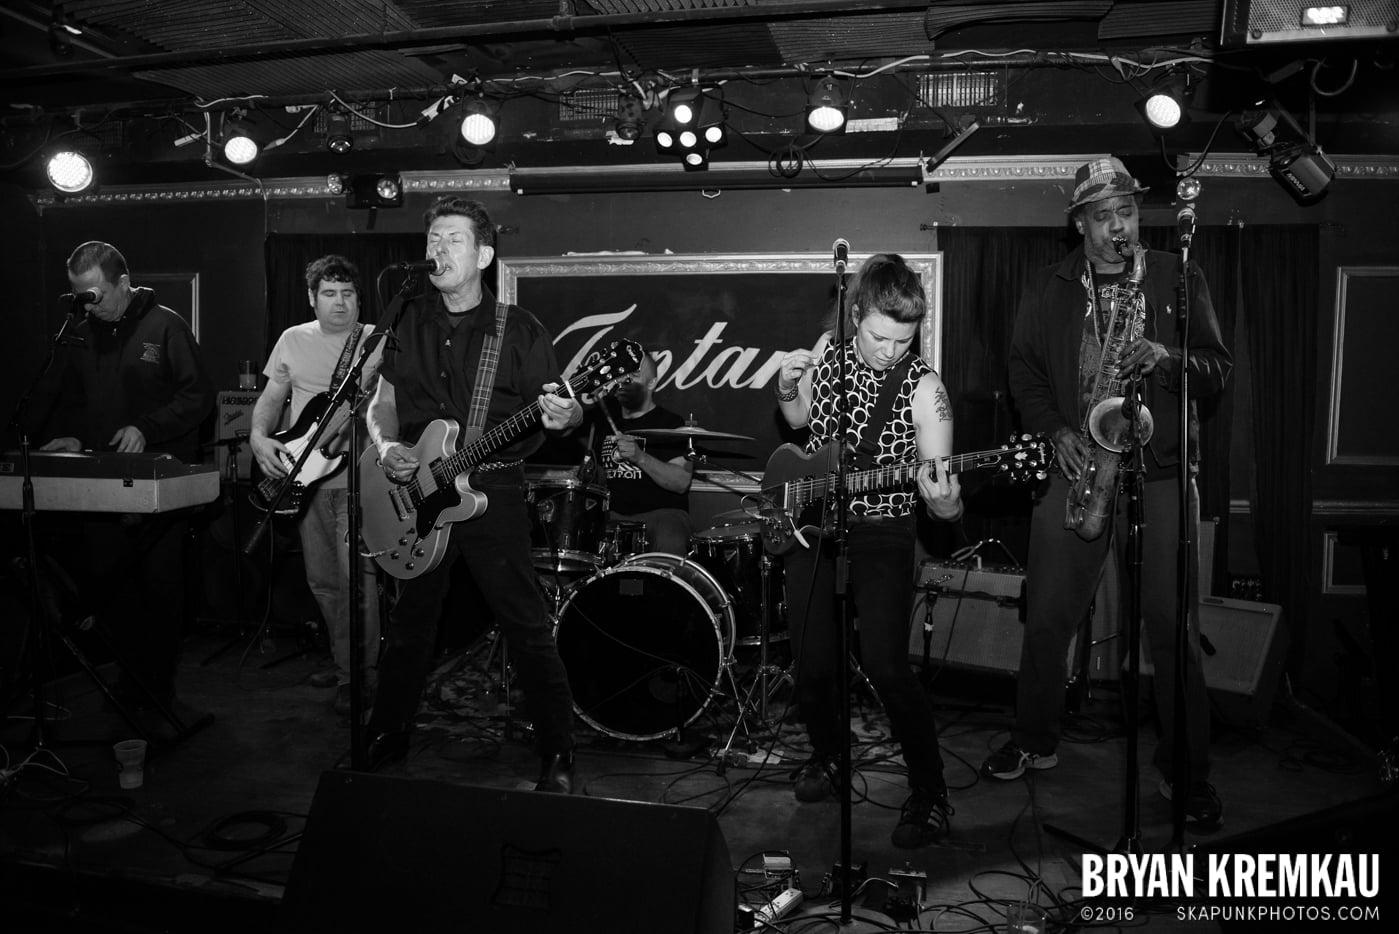 Roddy Radiation & The Scotch Bonnets @ Fontana's, NYC - 4.25.15 (25)